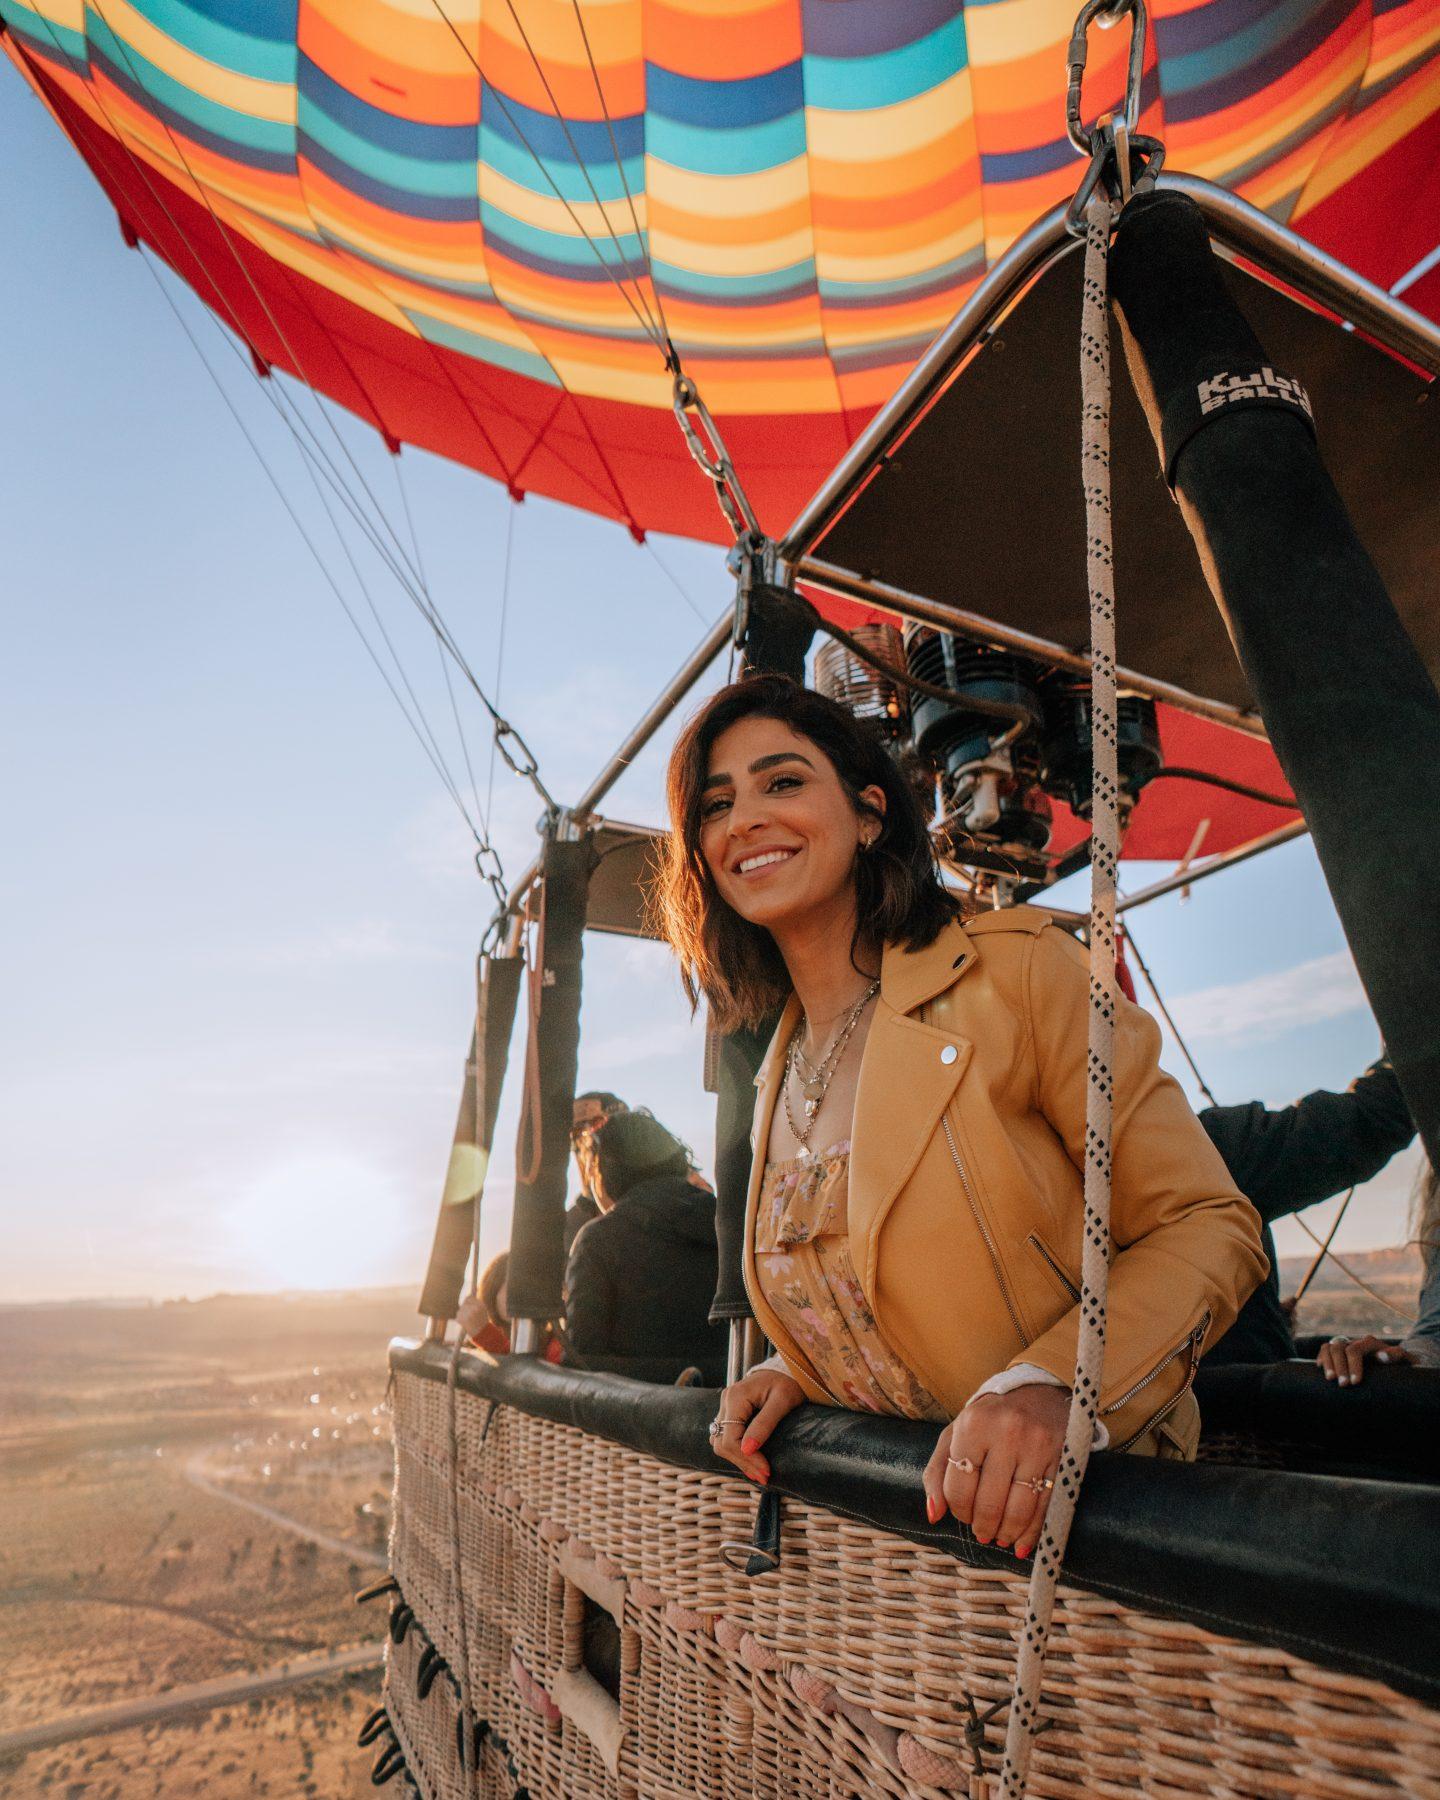 Hot air balloon ride over Moab Utah at sunrise